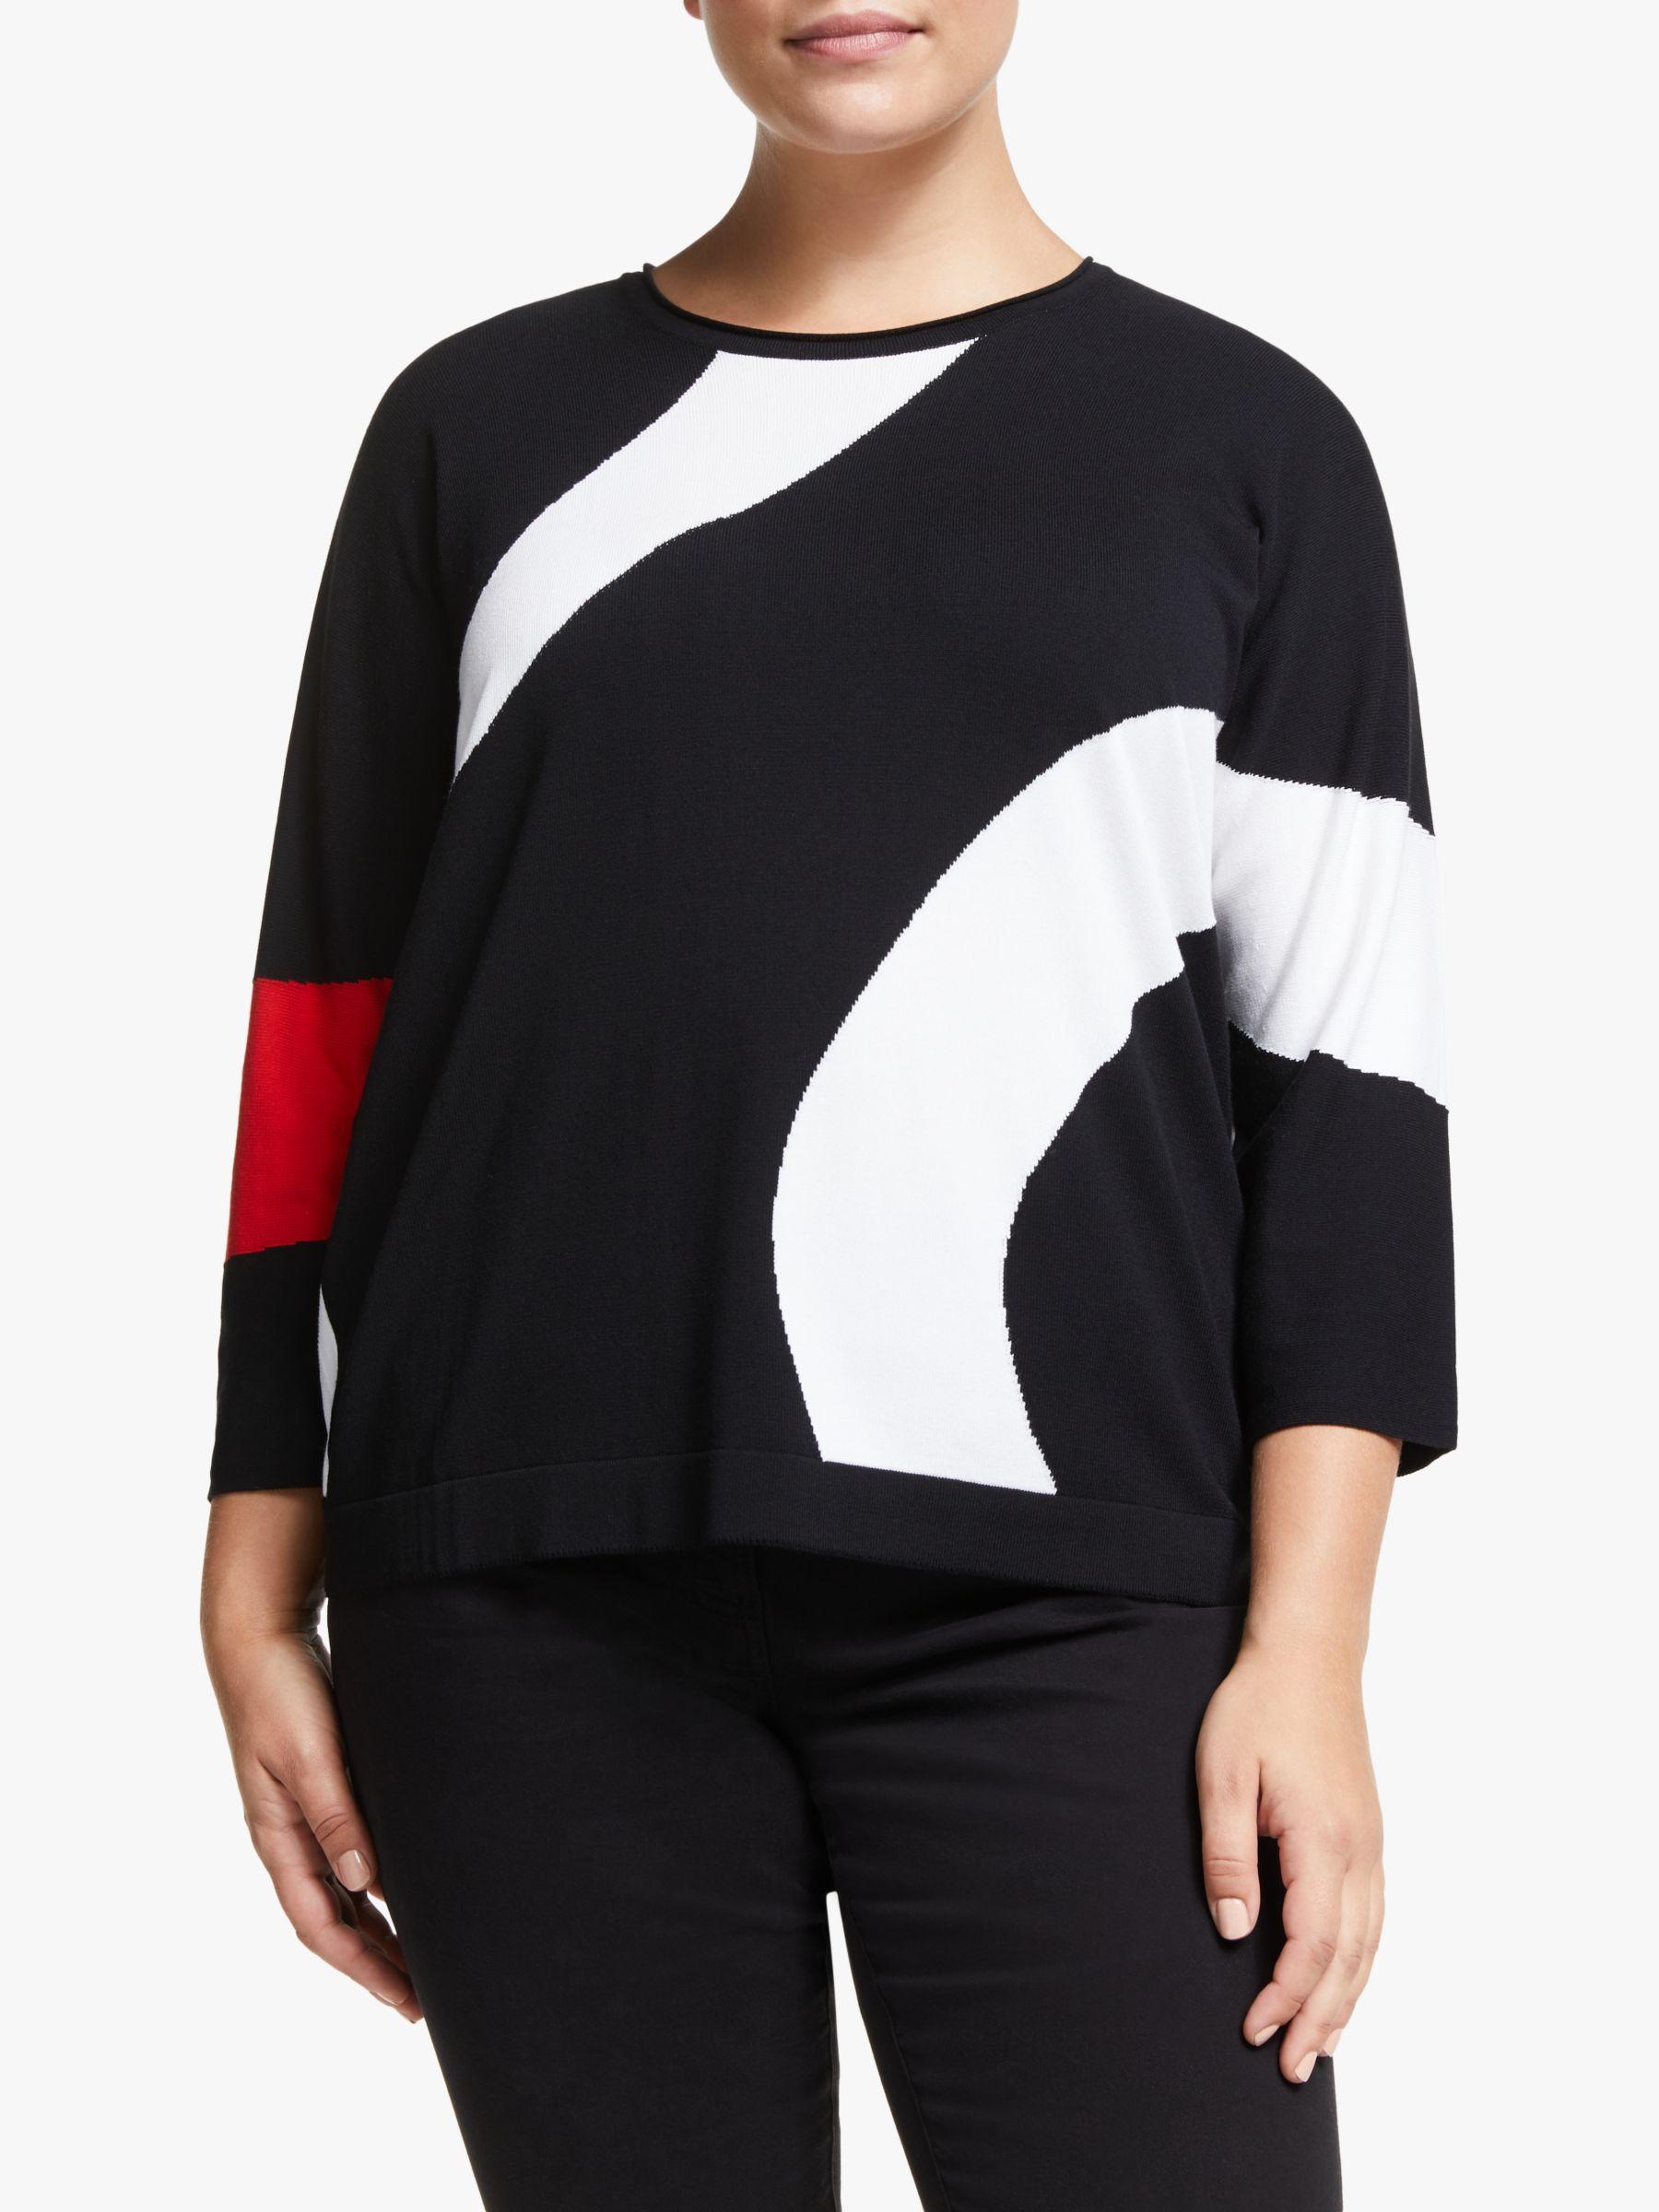 Persona by Marina Rinaldi Persona by Marina Rinaldi Swirl Stripe Jumper, Black